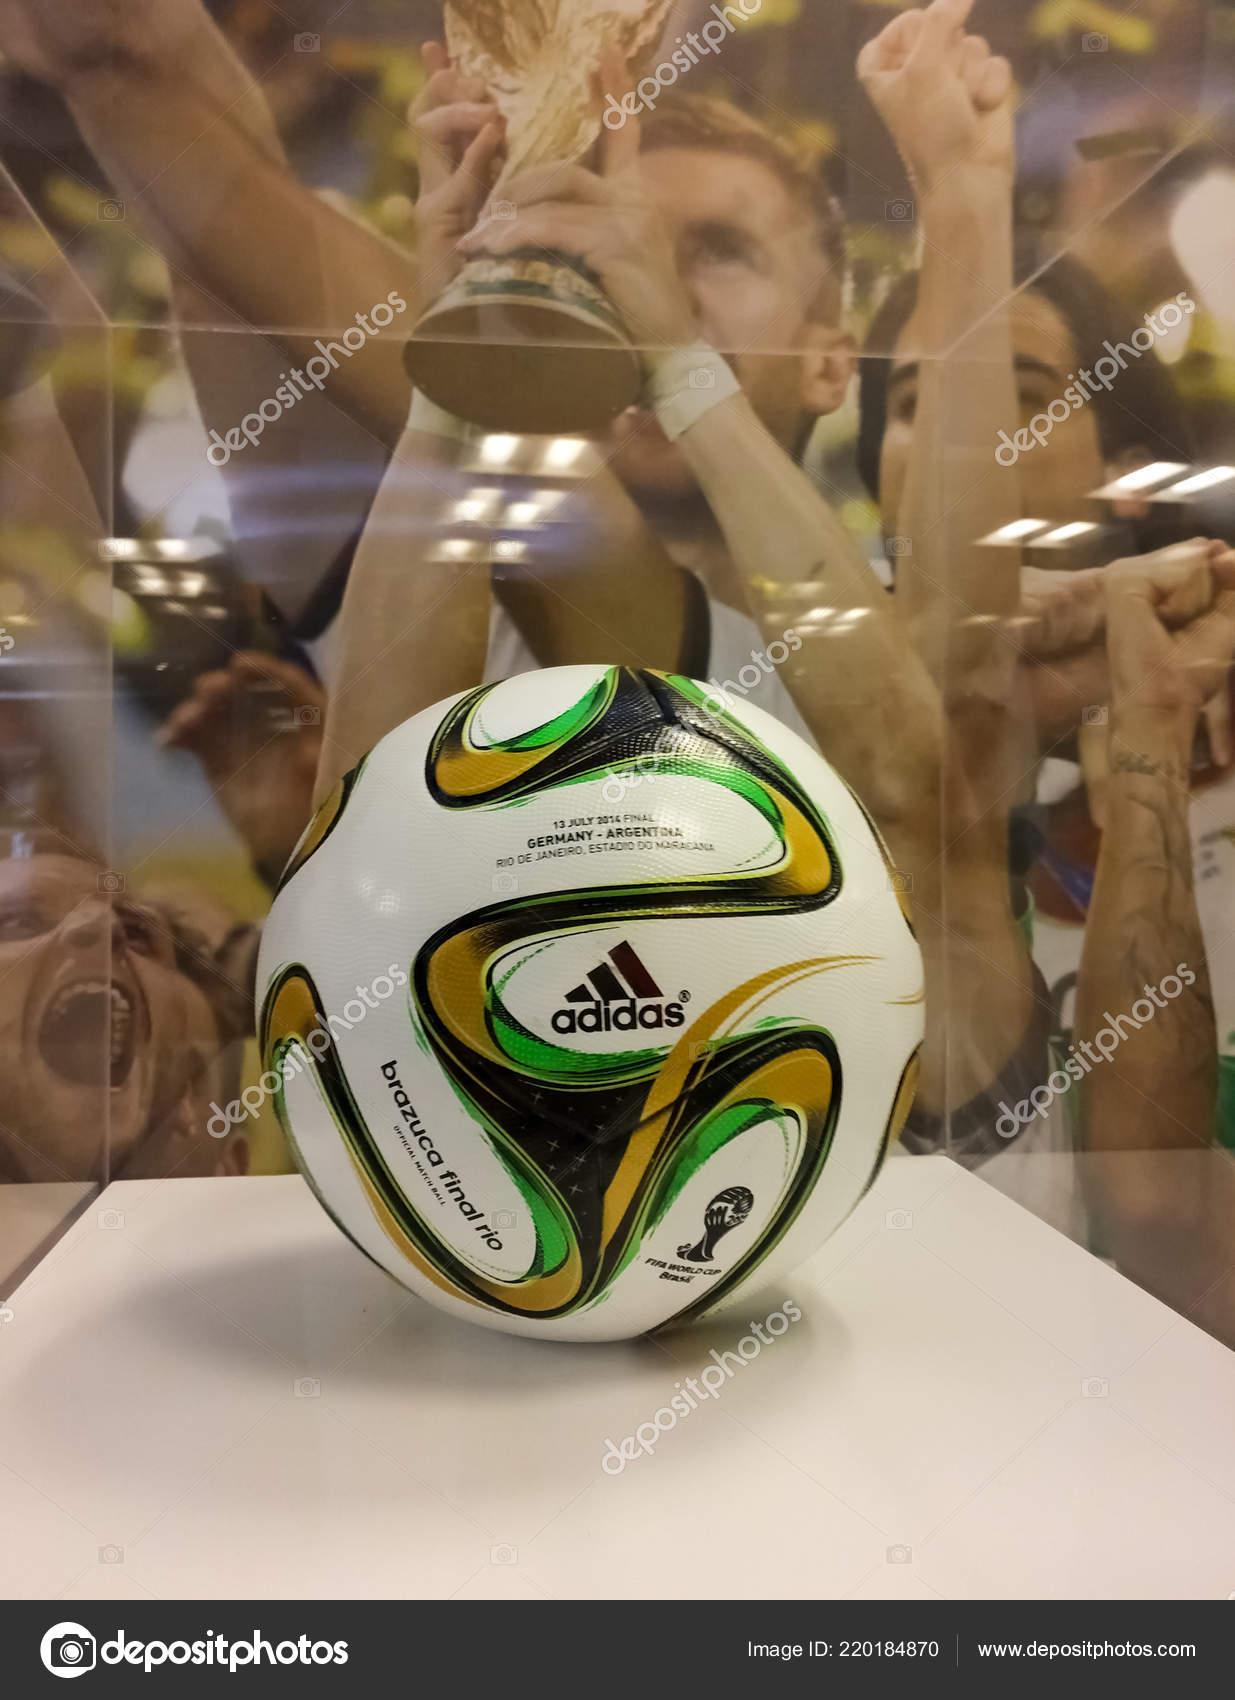 09dbd444d8 Bola Futebol Usada Copa Mundo Fifa Brasil 2014 Chamado Brazuca — Fotografia  de Stock